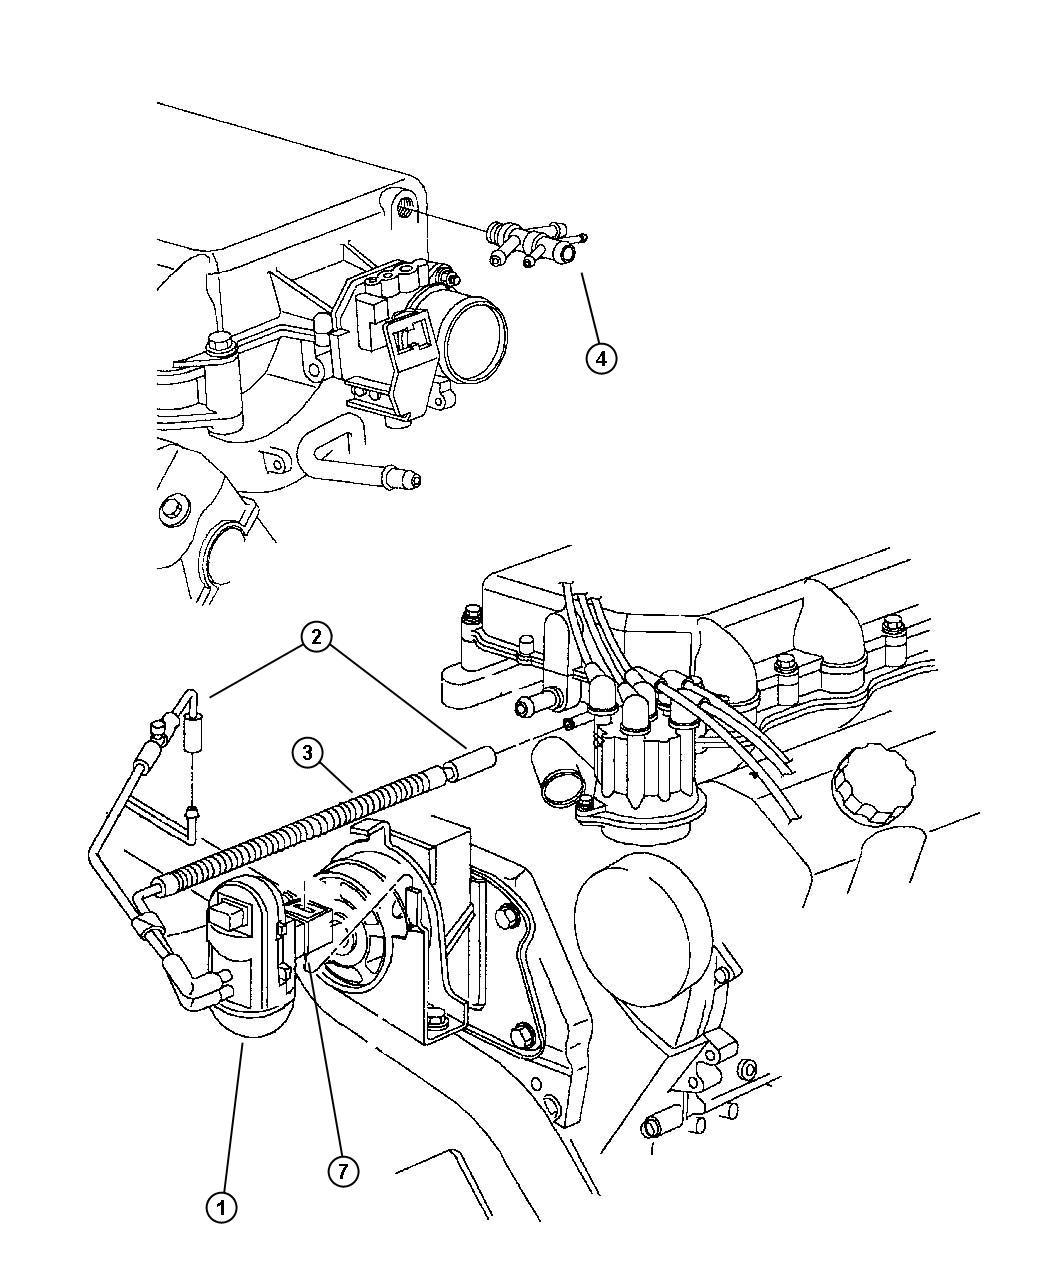 Plymouth Voyager Emission Harness 3 0l Efa Engine